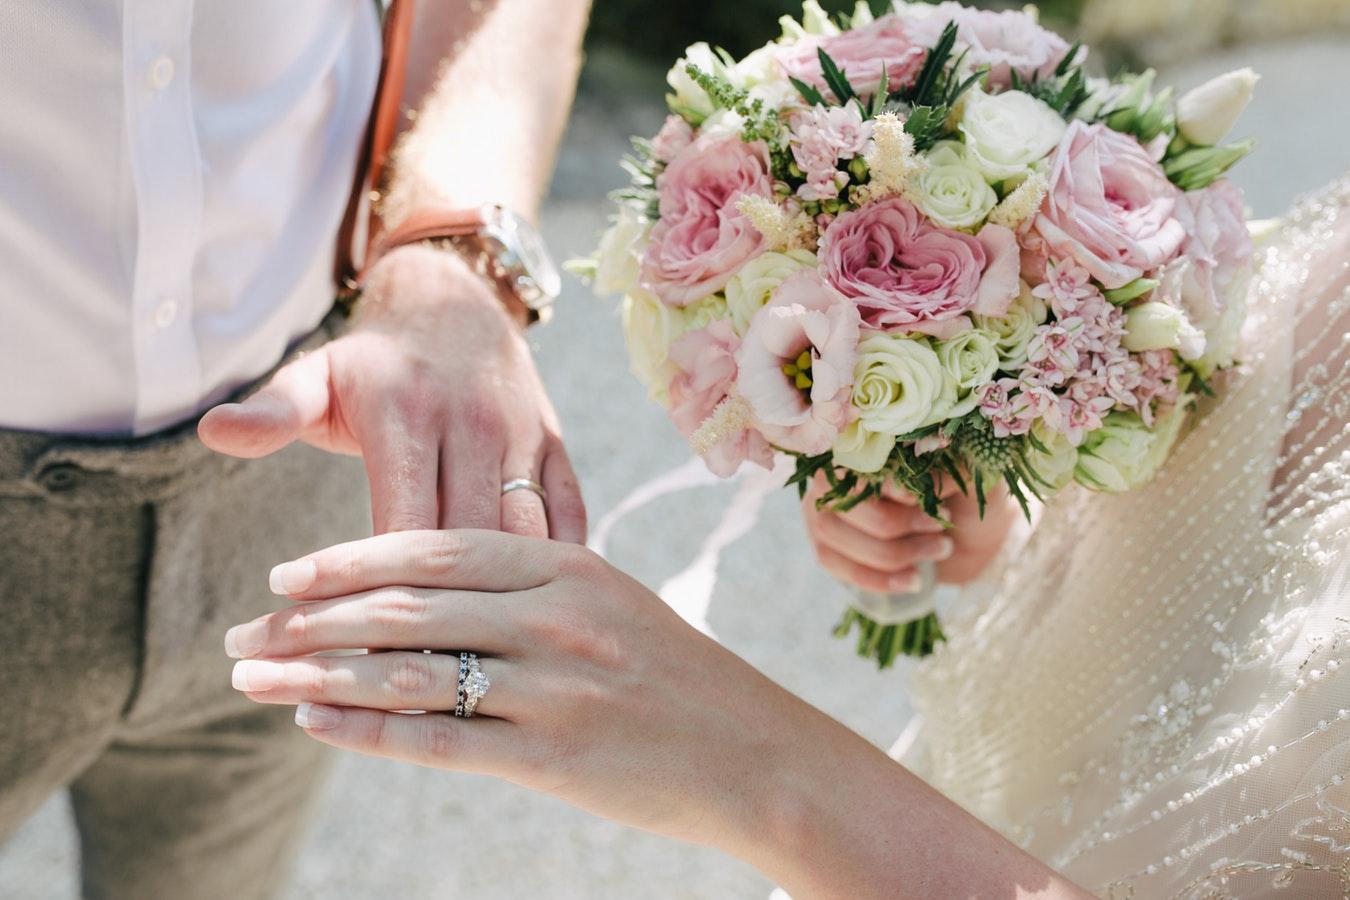 Frasi Famose Matrimonio Auguri.Le Frasi Di Matrimonio Dei Poeti Piu Famosi Per Celebrare Il